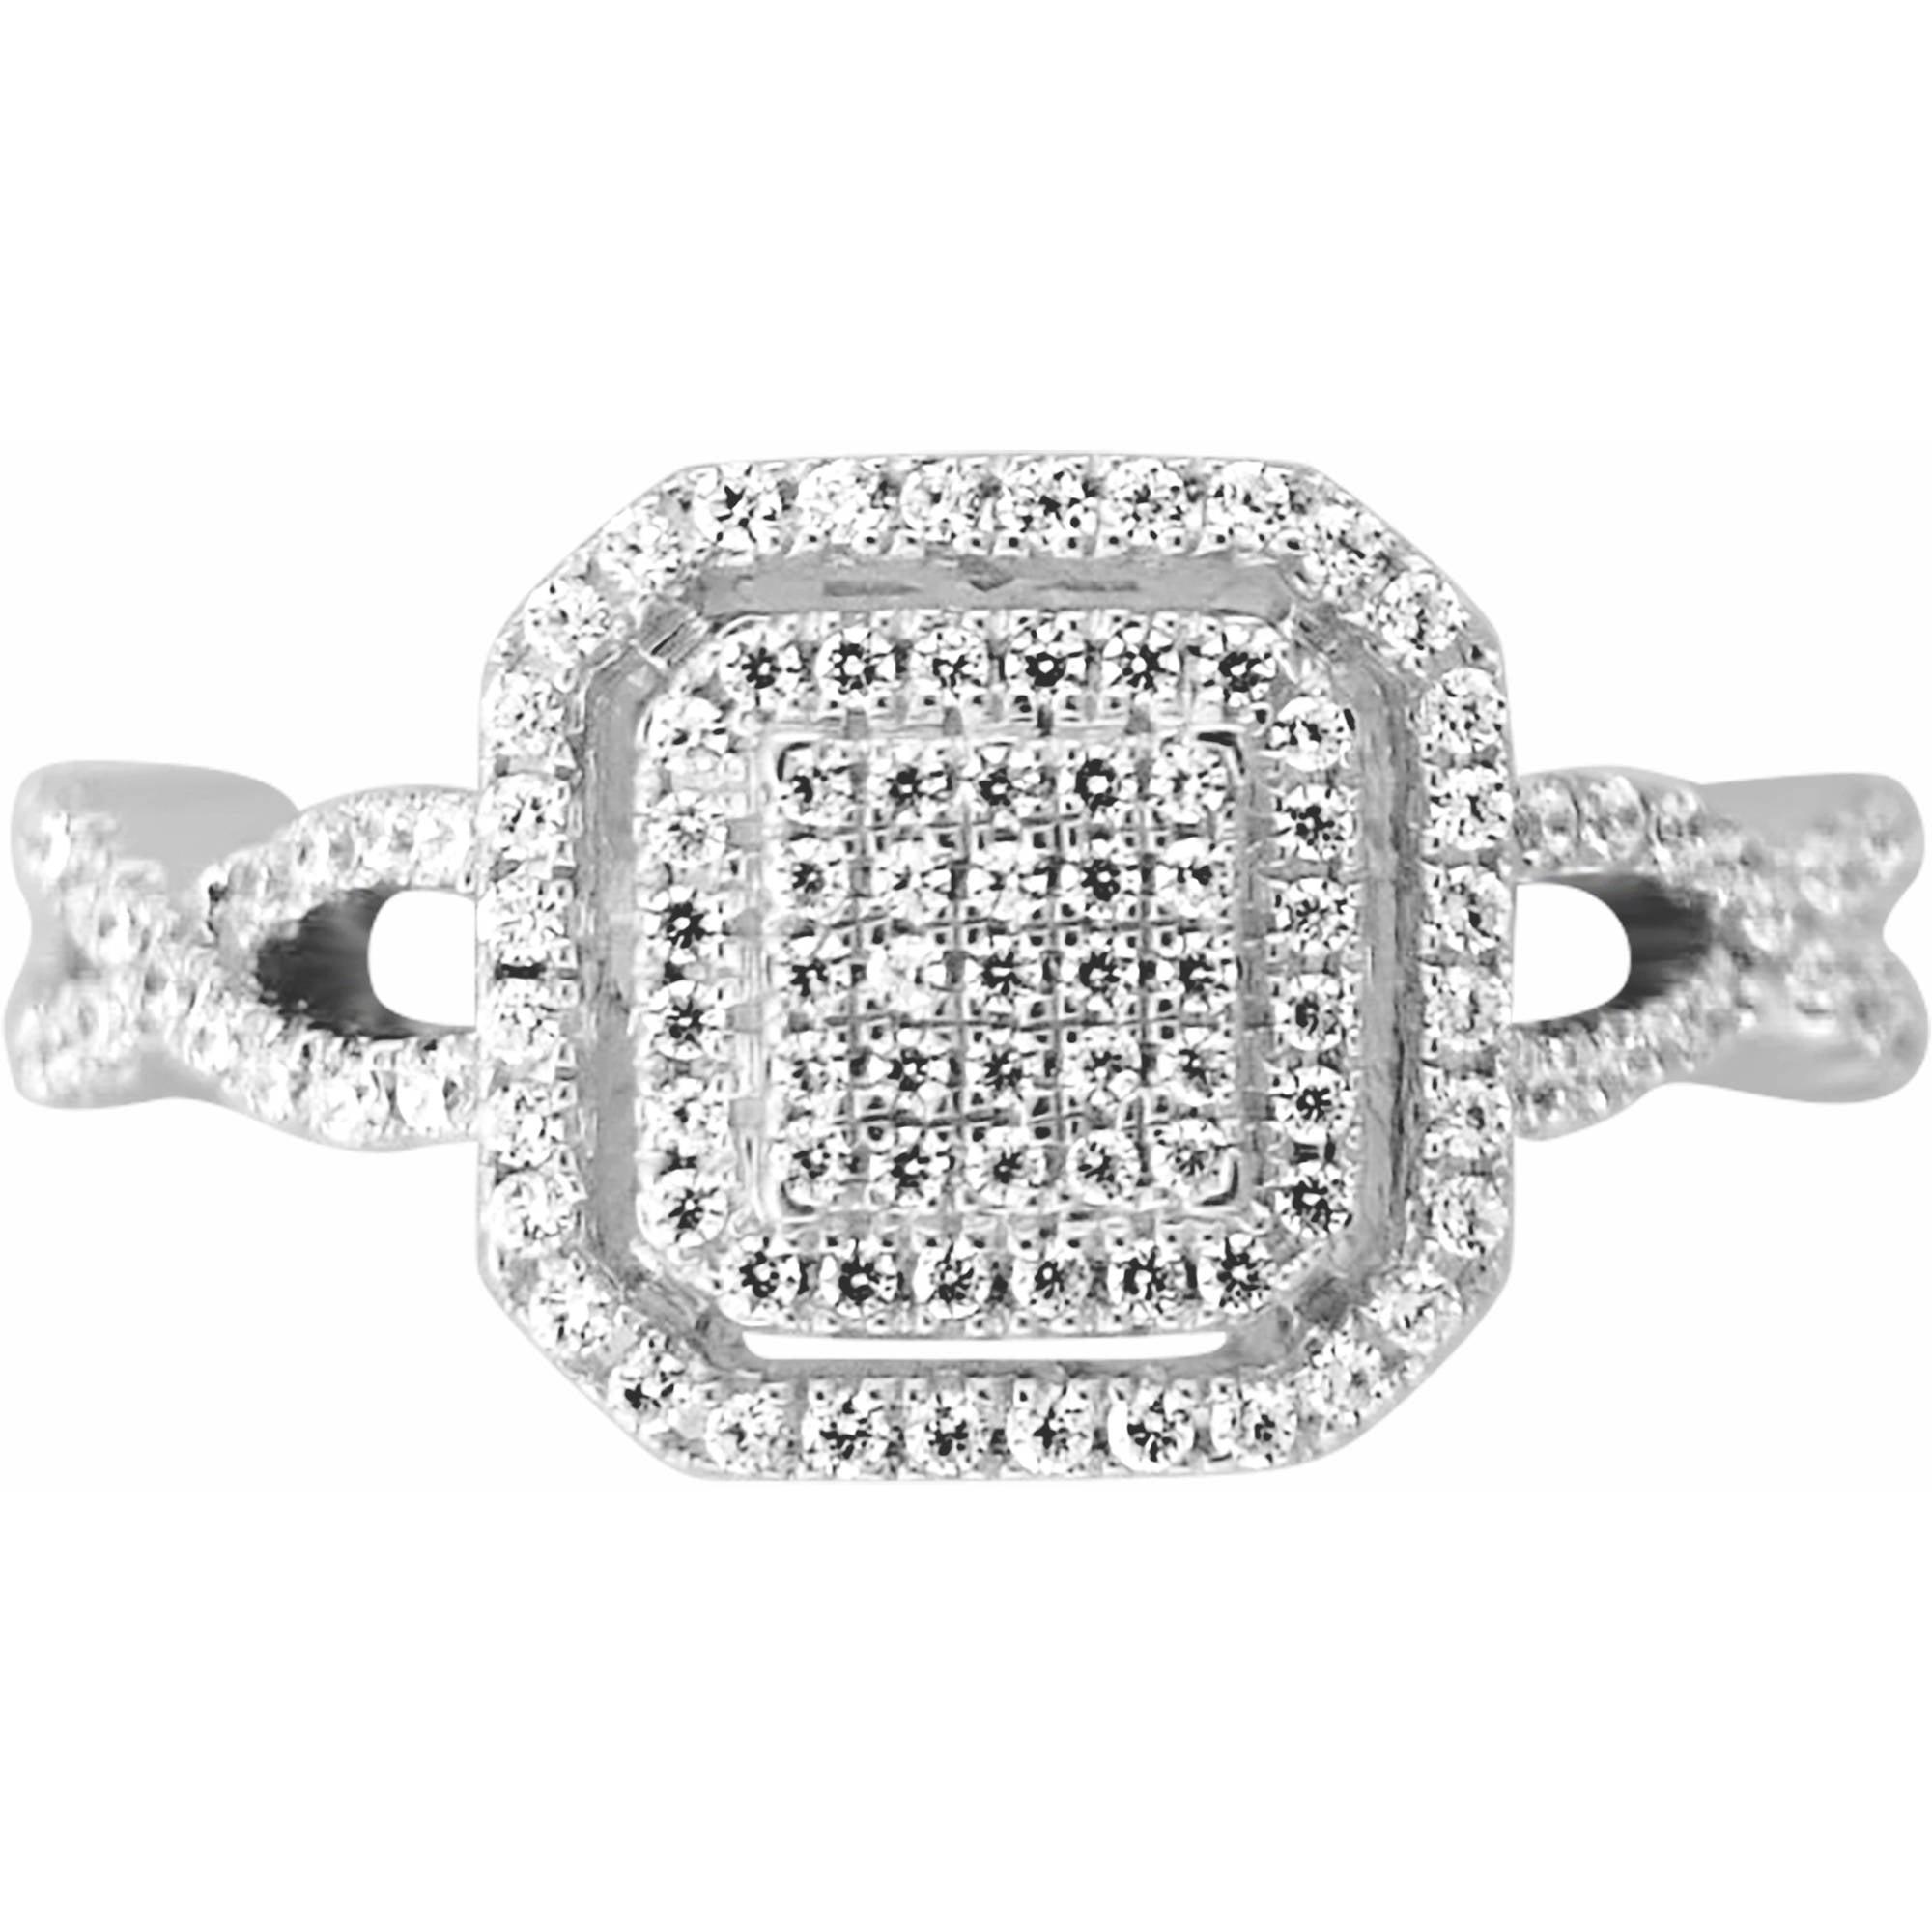 Carina 1/2 Carat T.W. Square Diamond Sterling Silver Cluster Fashion Ring